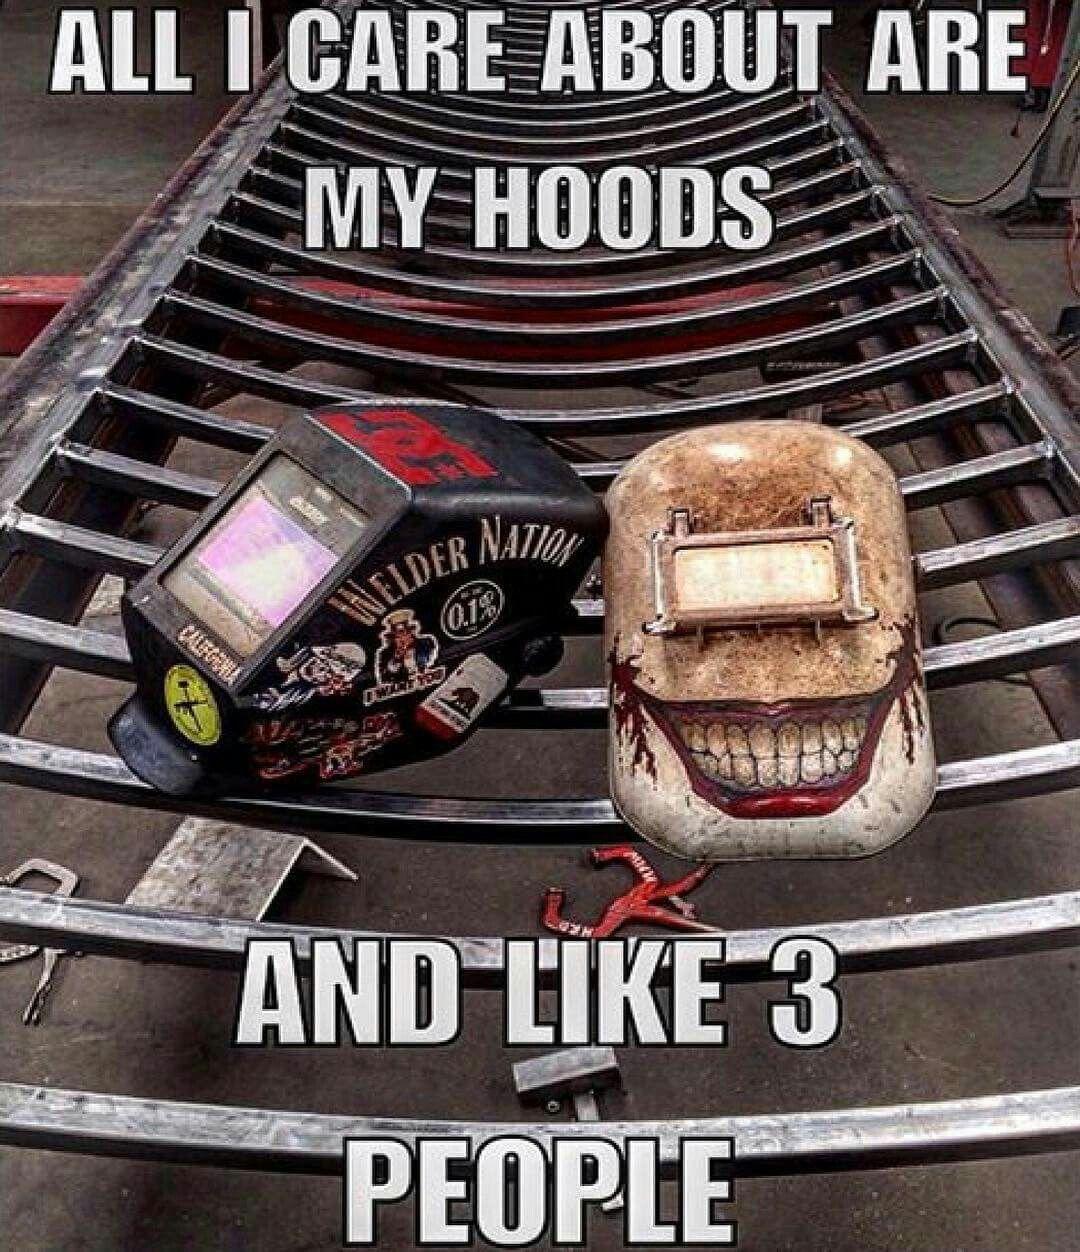 Pin By Randy Lash On Welding Mask Pinterest Masking - Custom vinyl decals for car hoodscustom hood decals etsy